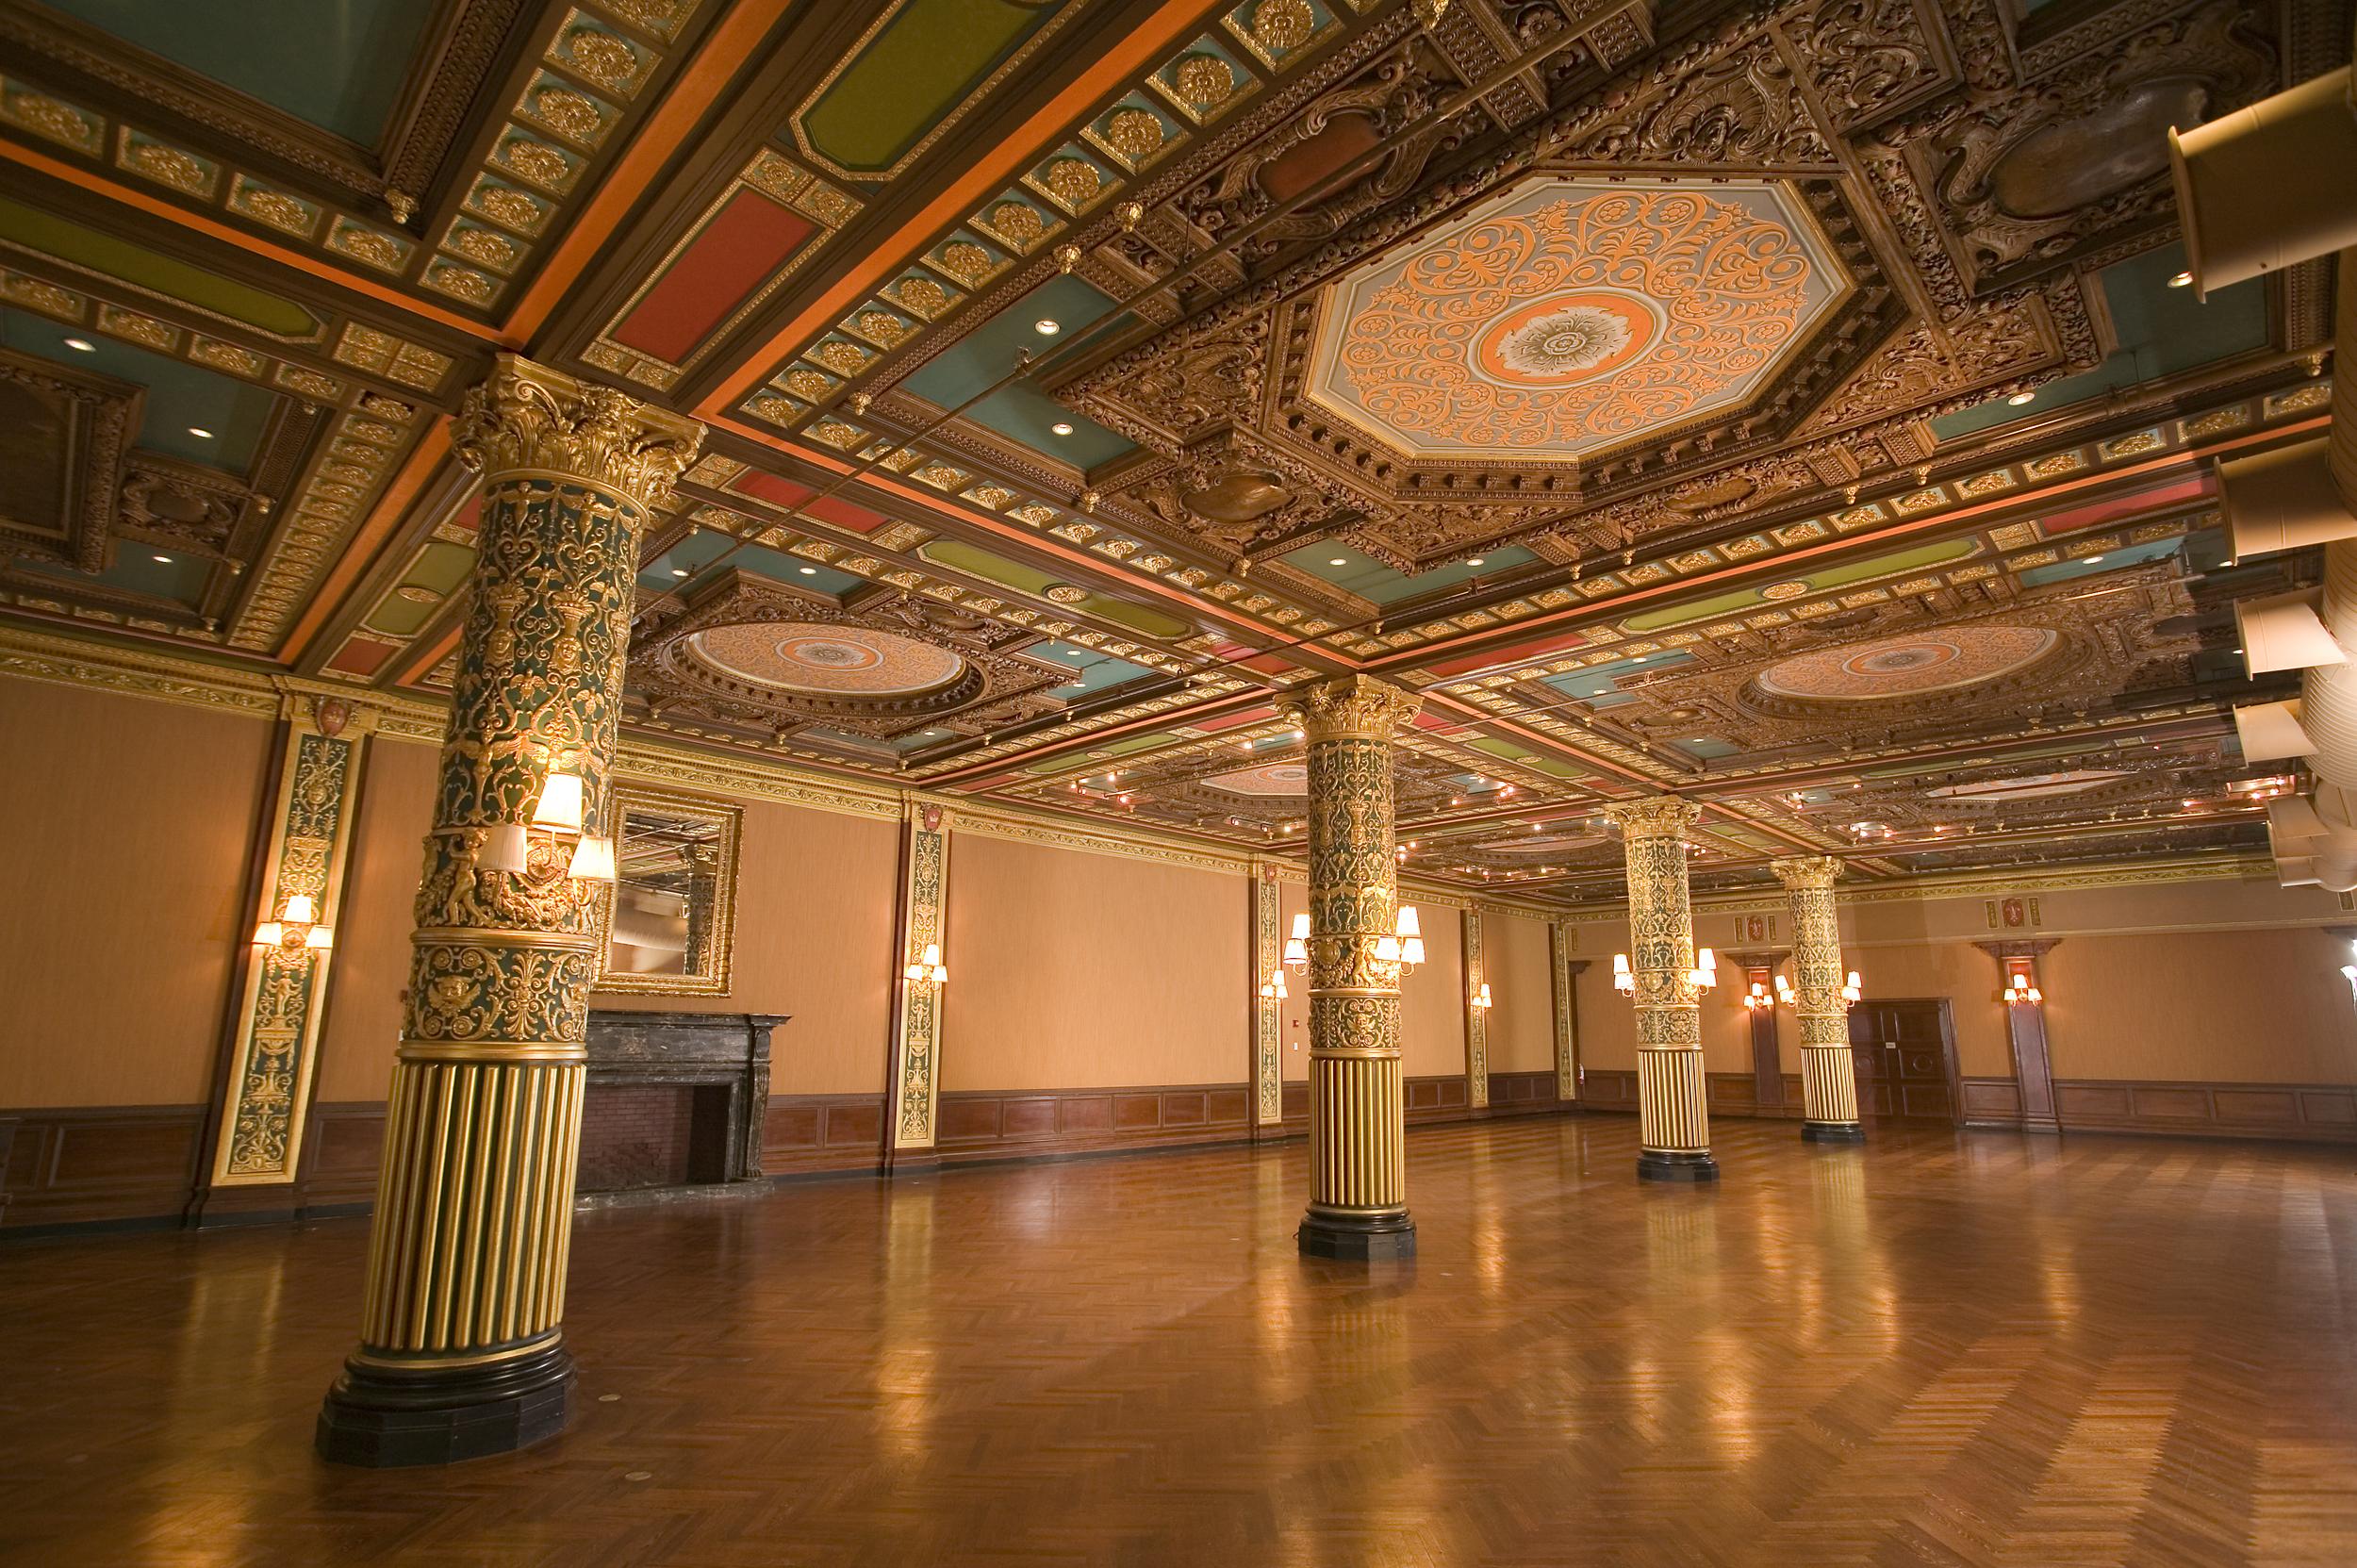 The Prince George Ballroom